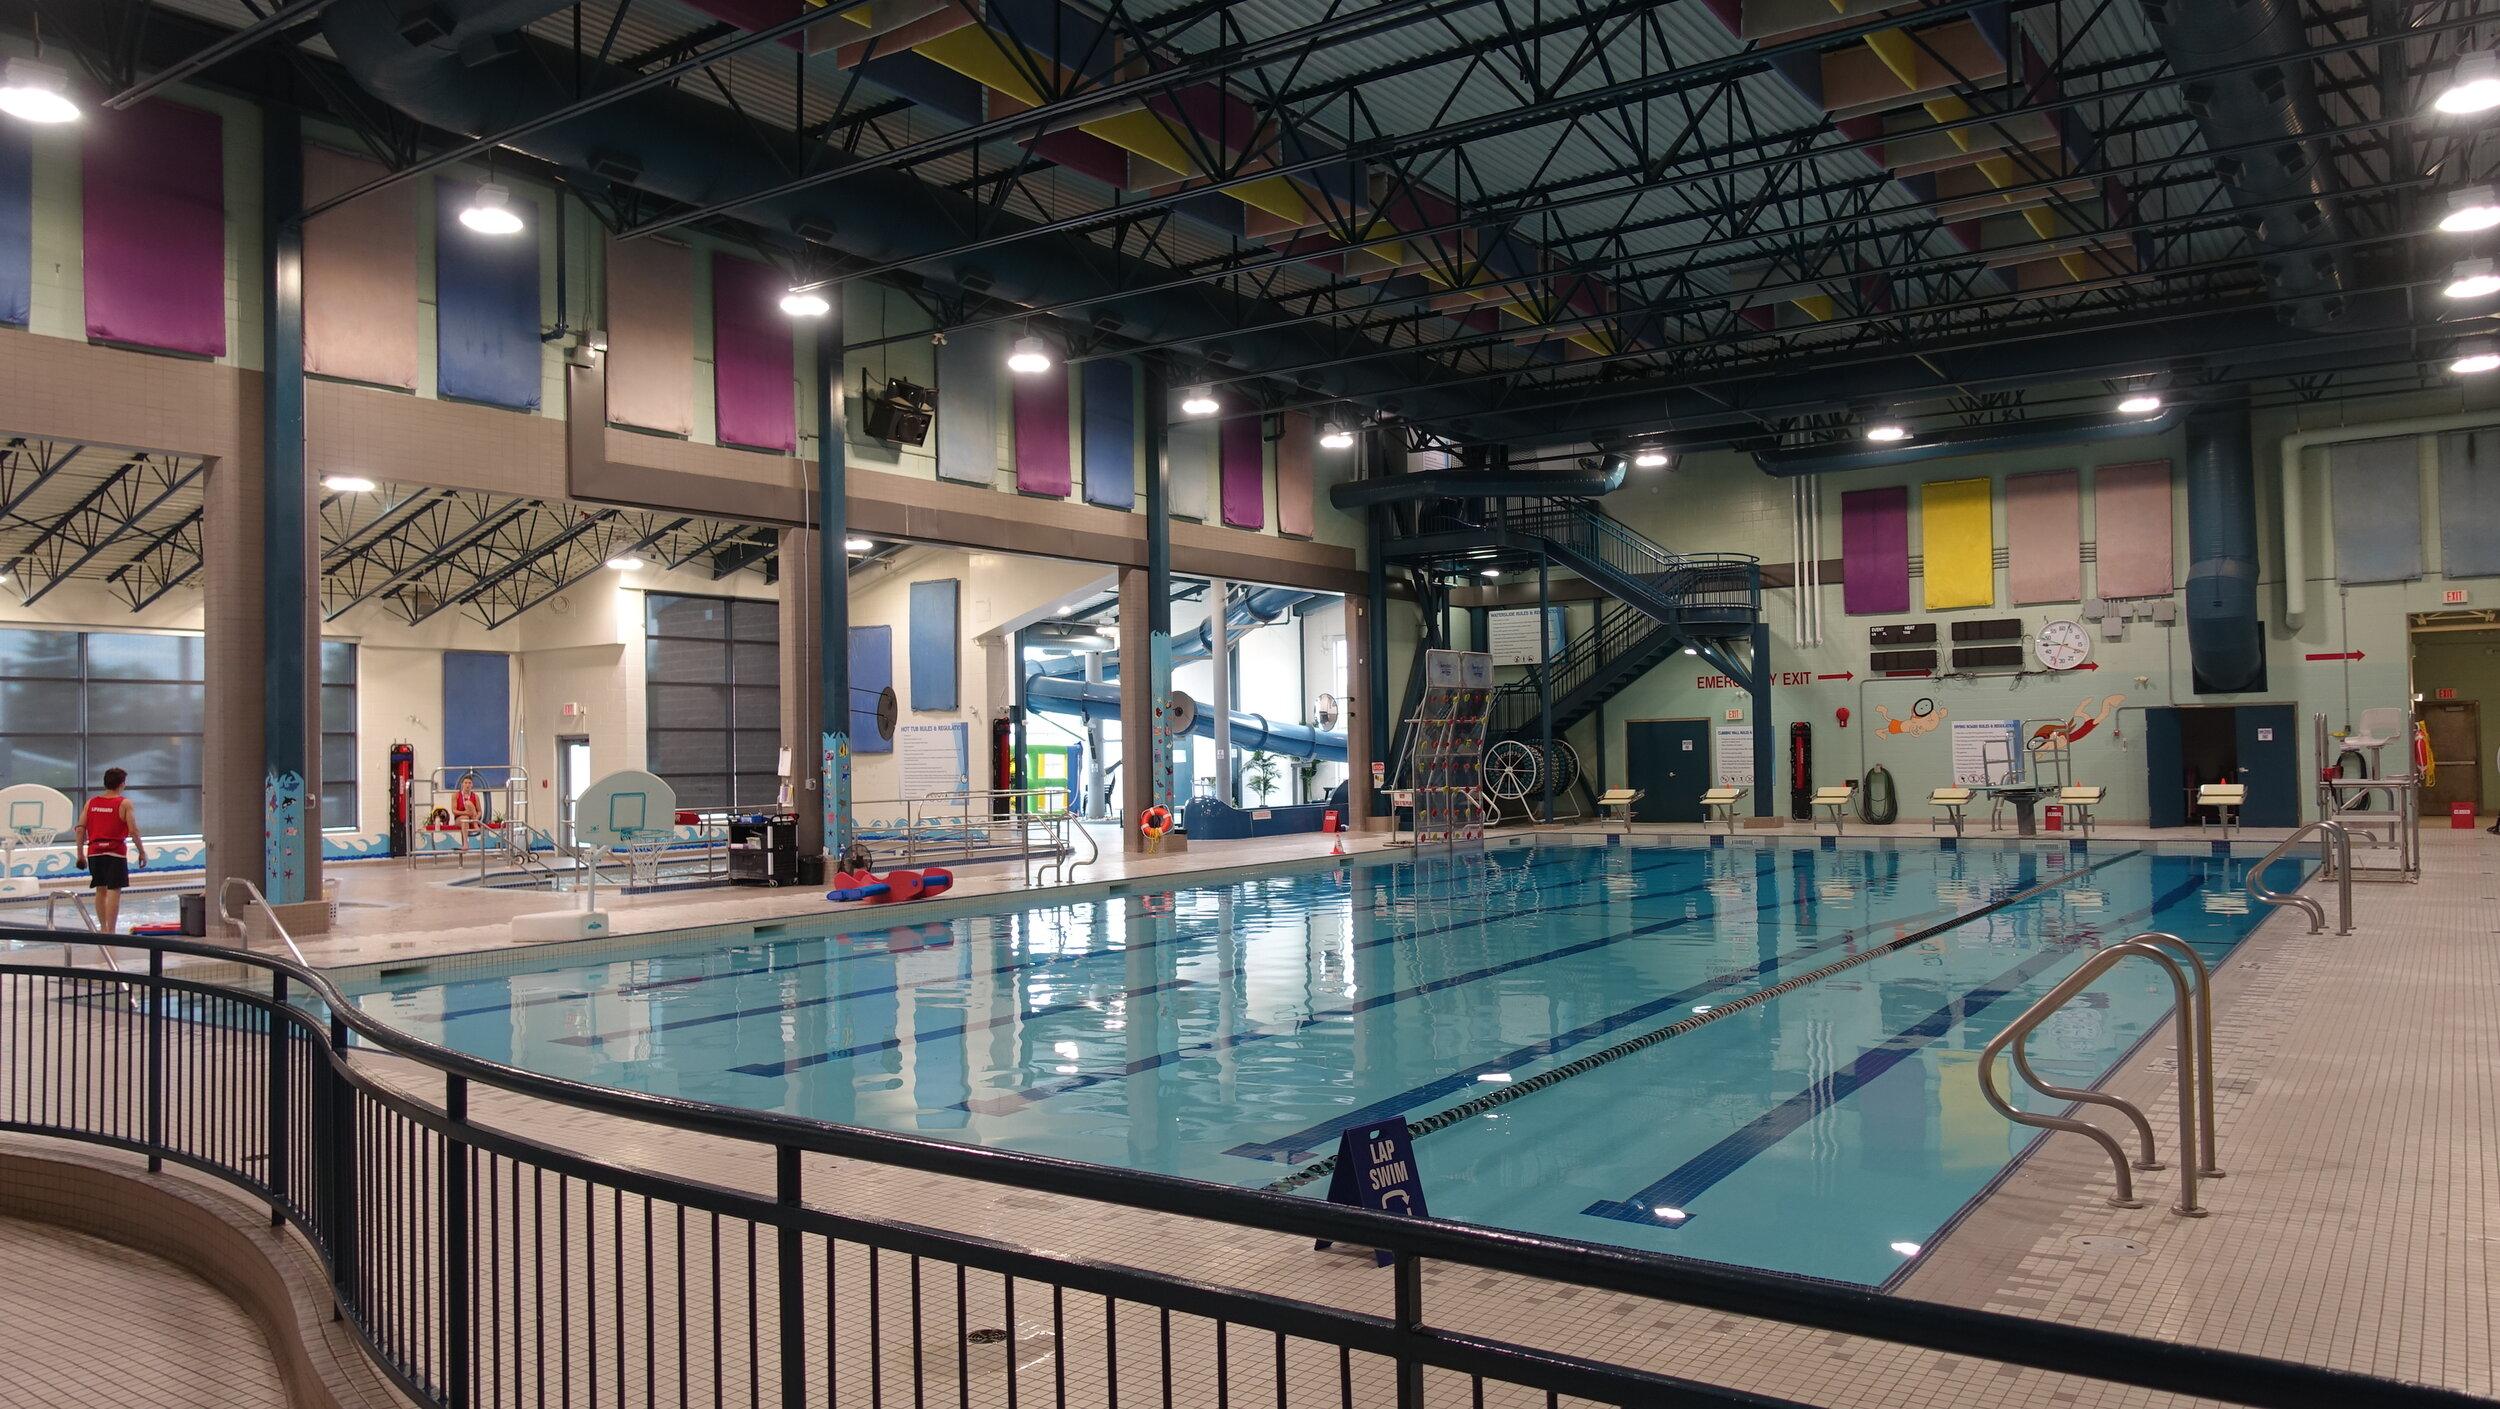 Strathmore's Aquatic Centre